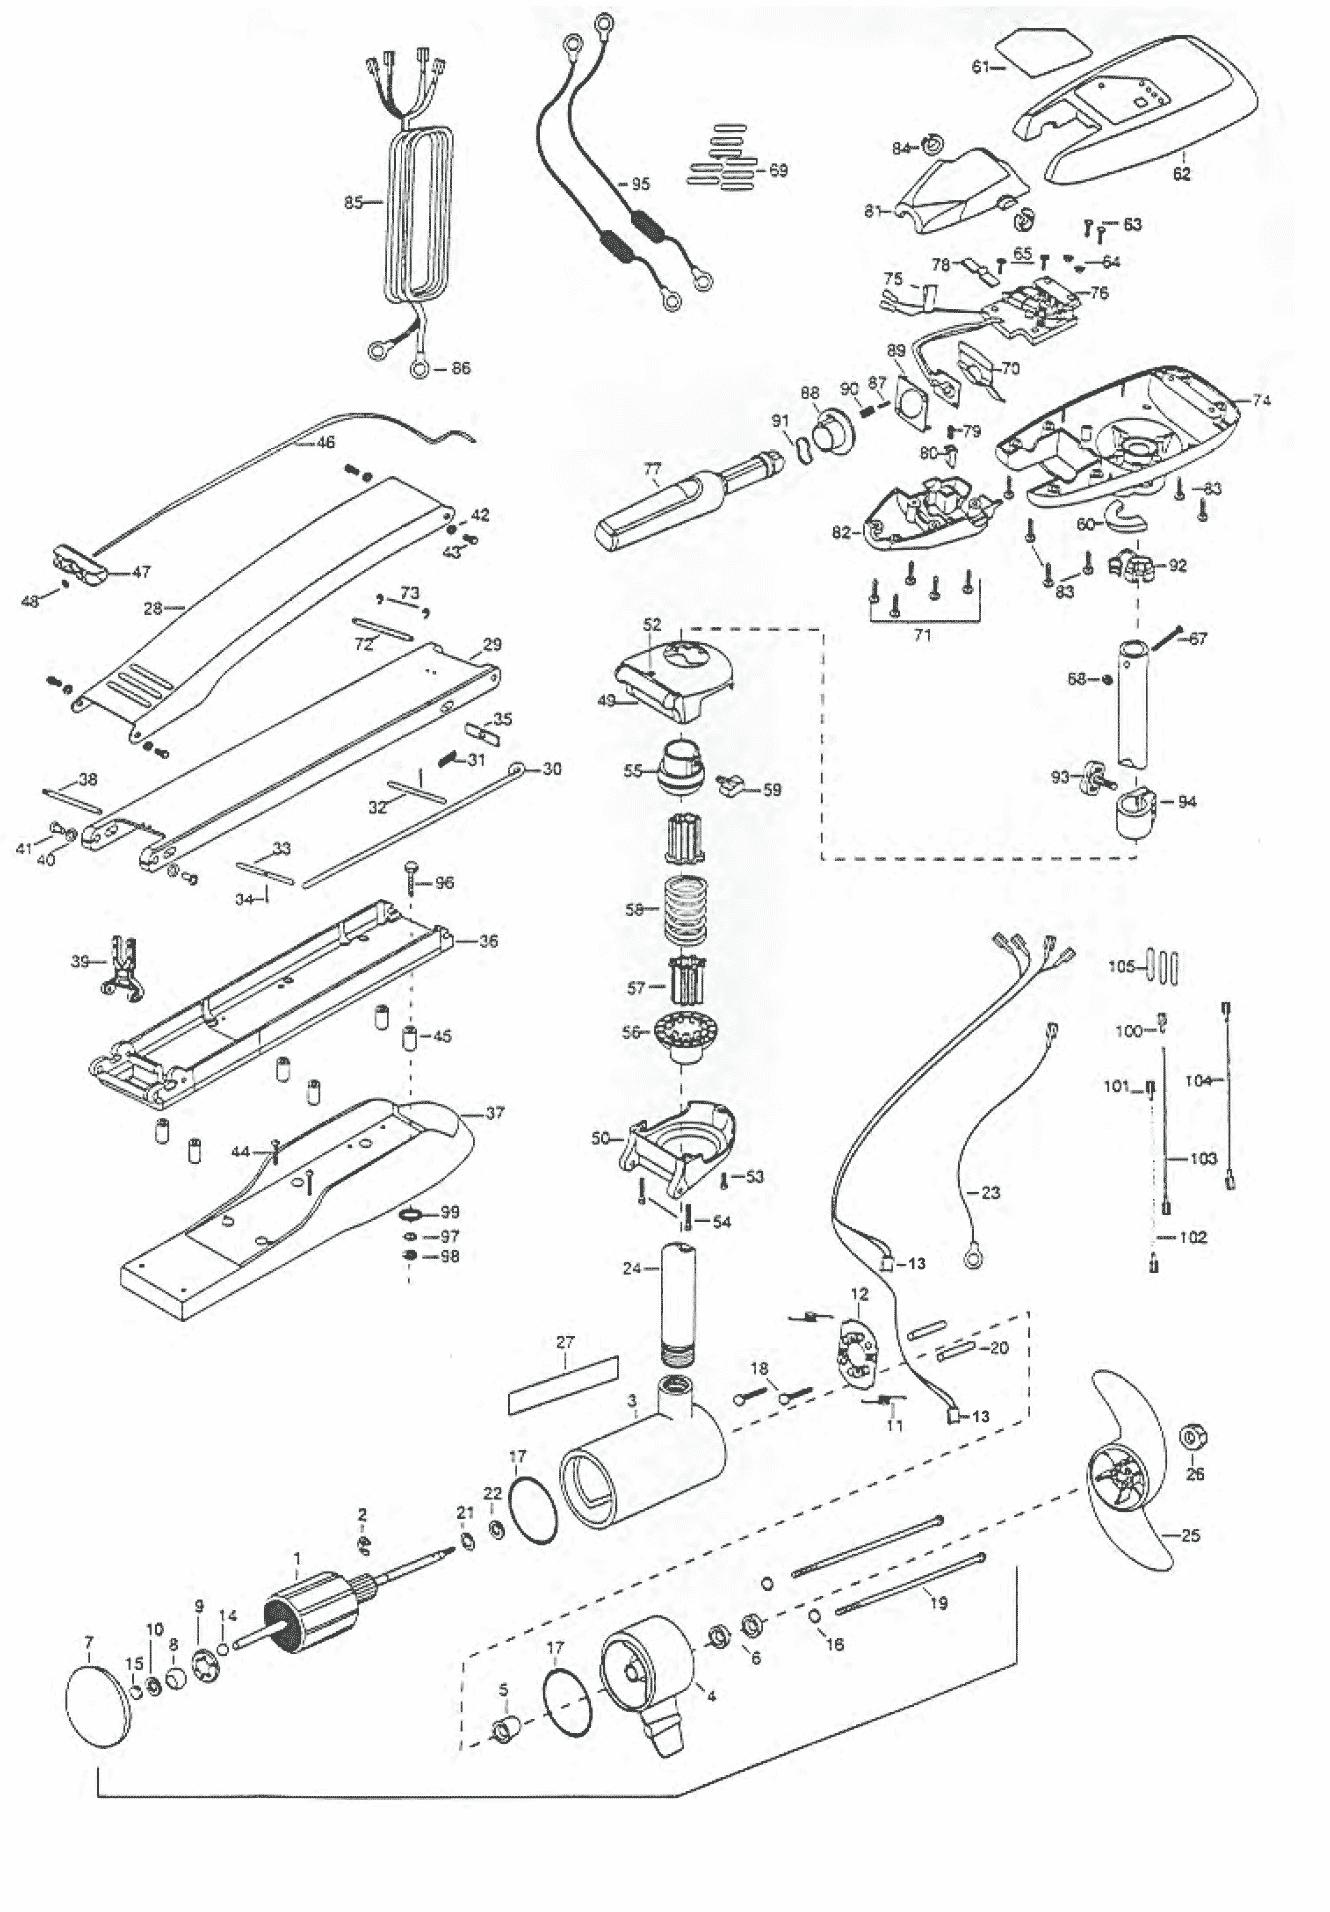 Minn kota riptide 101 bowguard 52 inch parts 2000 from for Riptide 101 trolling motor